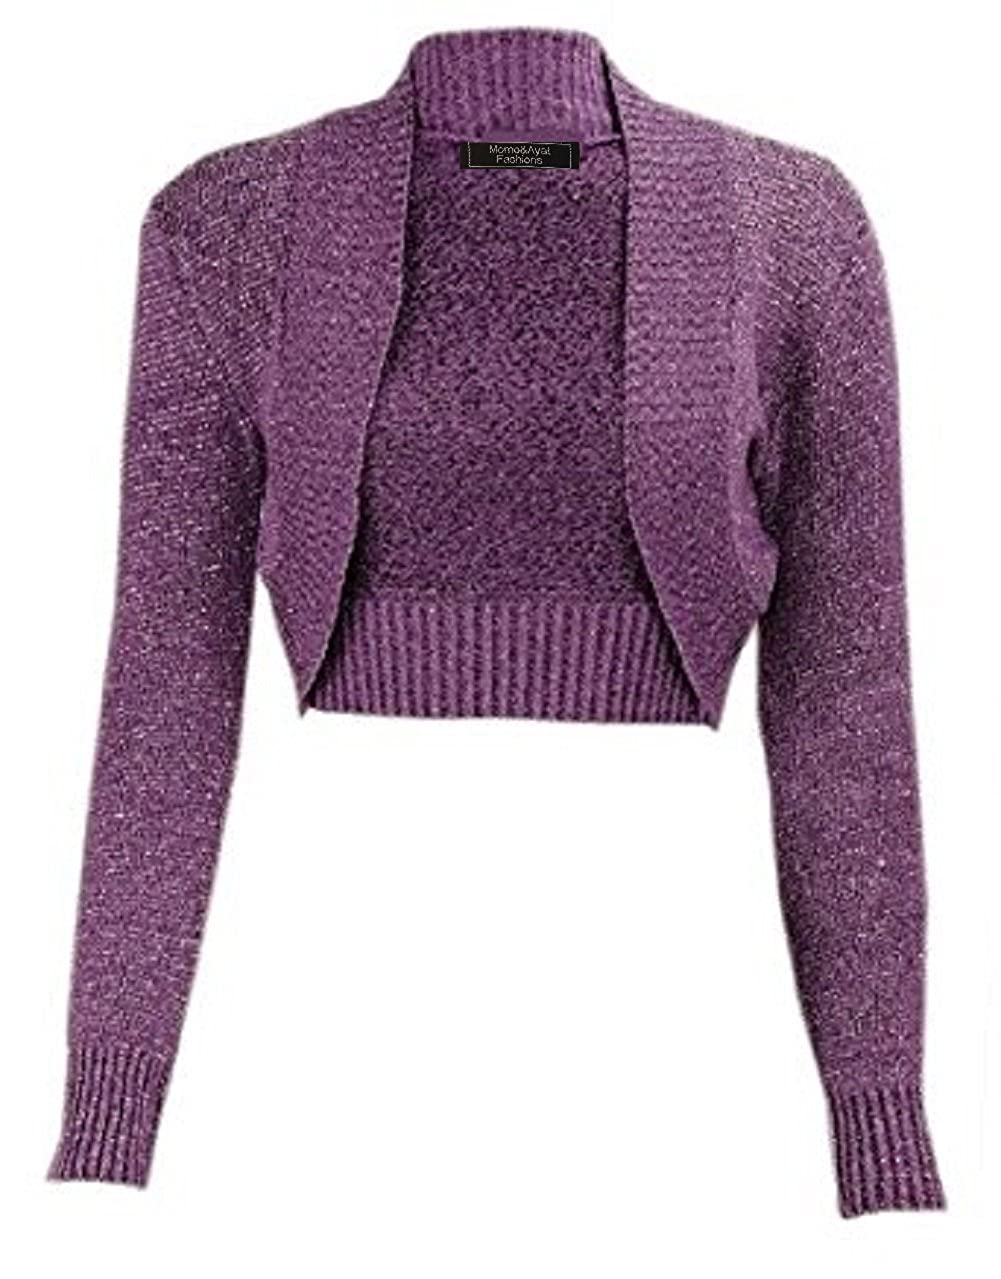 Momo/&Ayat Fashions Damen M/ädchen Lurex Metallic Ribbed Collar Geerntet Shrug EUR Gr/ö/ße 36-54